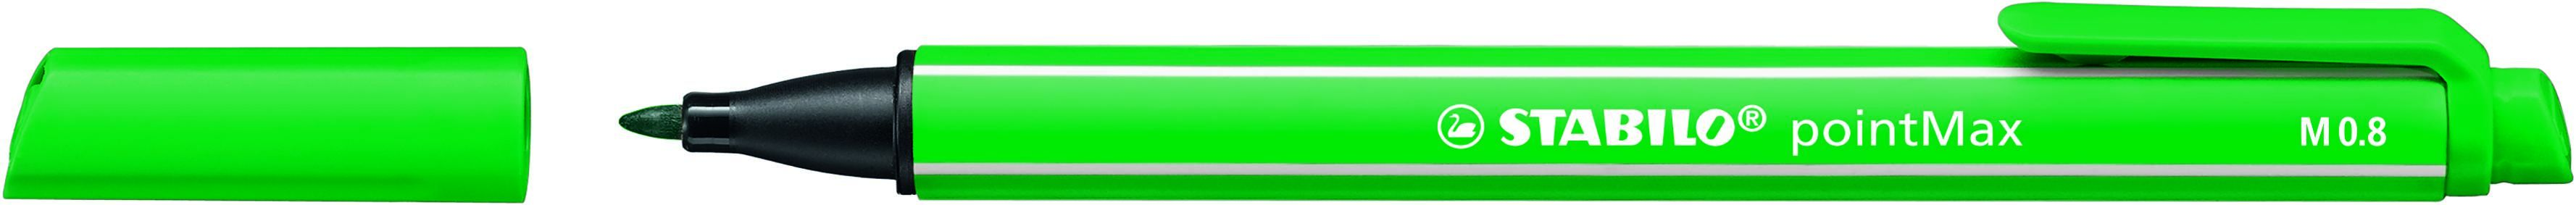 STABILO pointMax - stylo feutre - pointe moyenne -vert émeraude